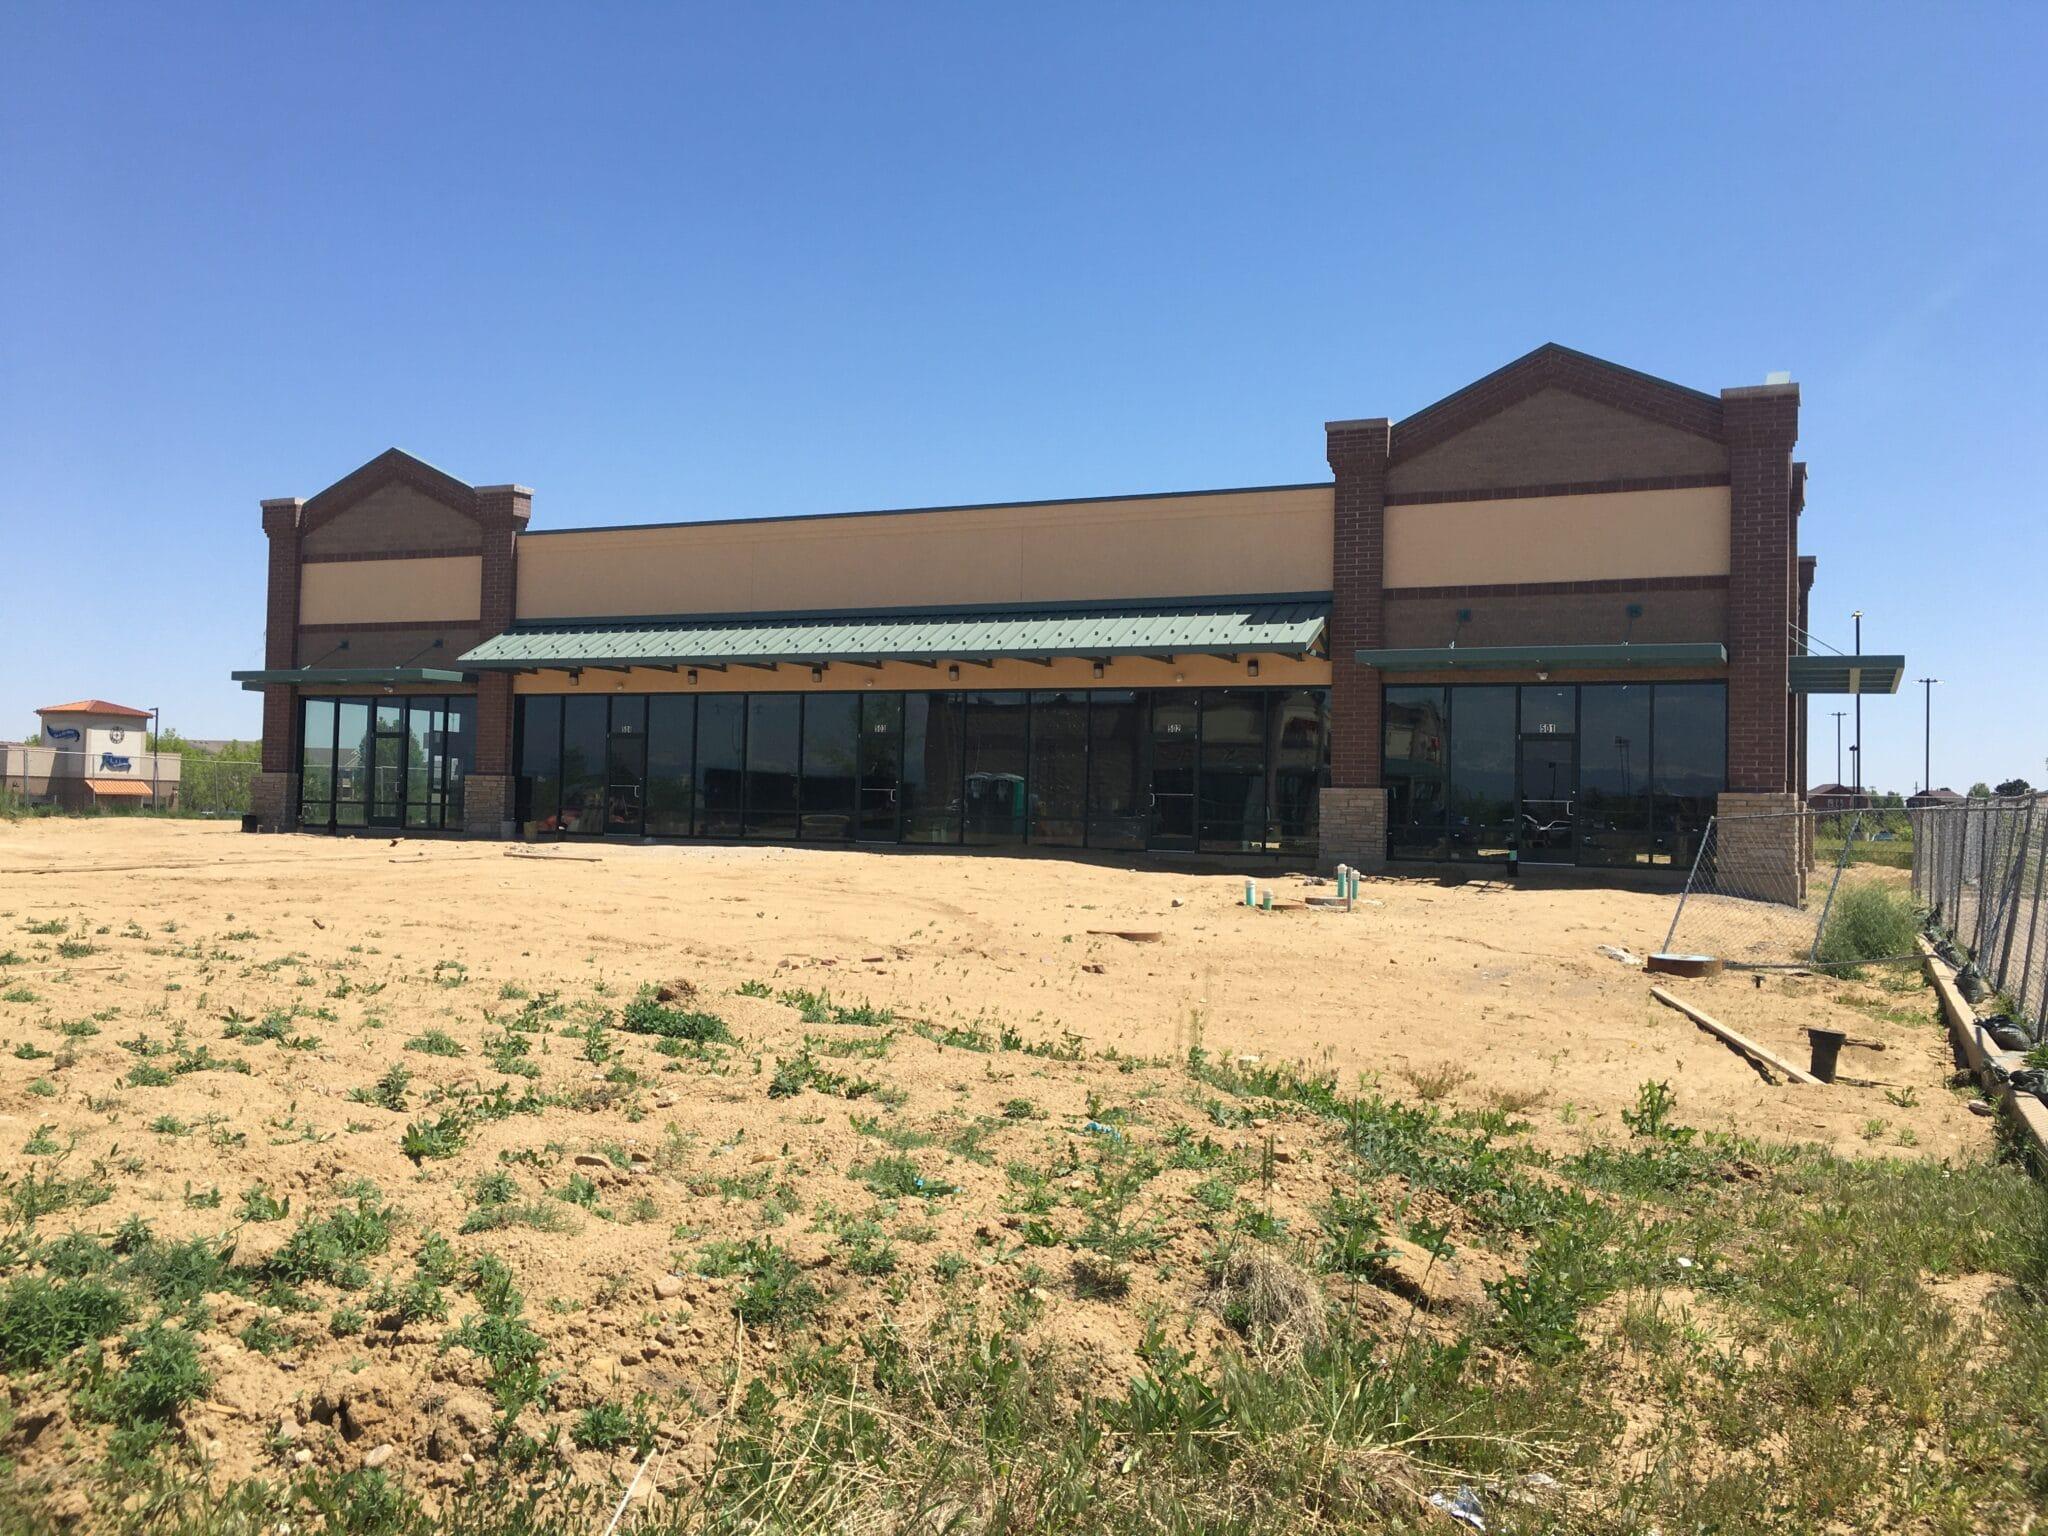 Photograph of High Plains Marketplace Retail development